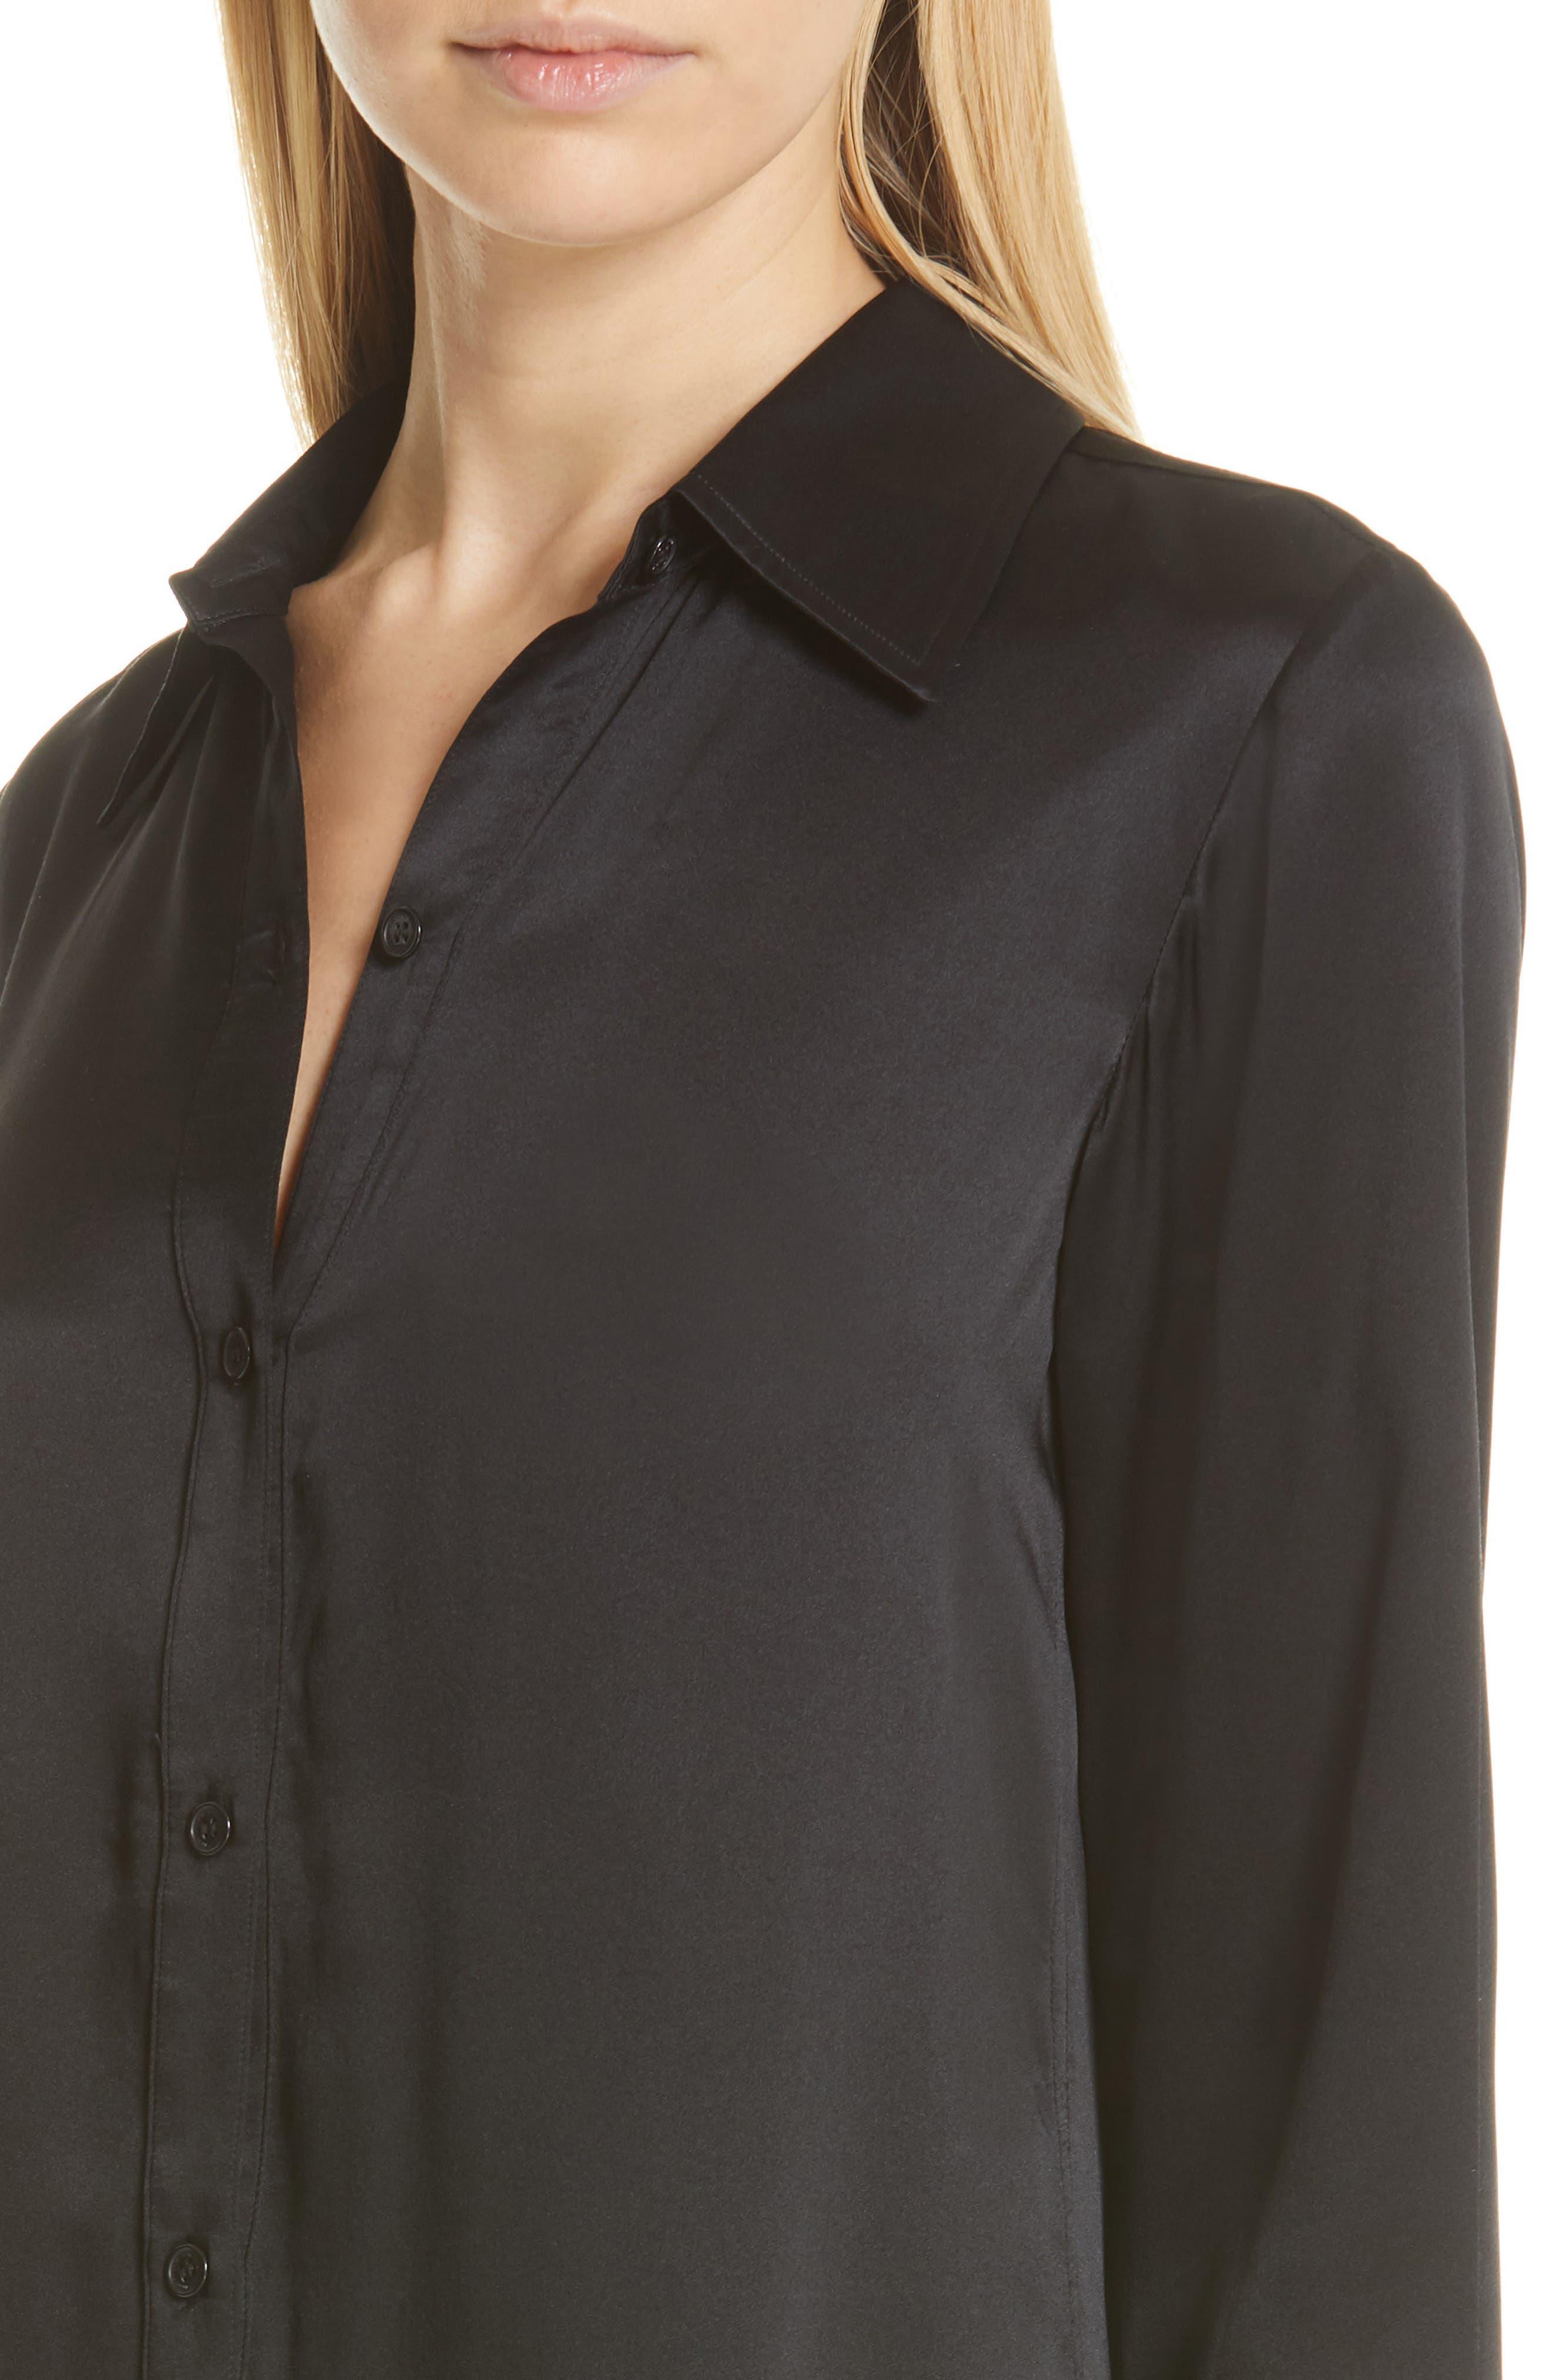 NILI LOTAN, Cassidy Silk Shirtdress, Alternate thumbnail 5, color, BLACK